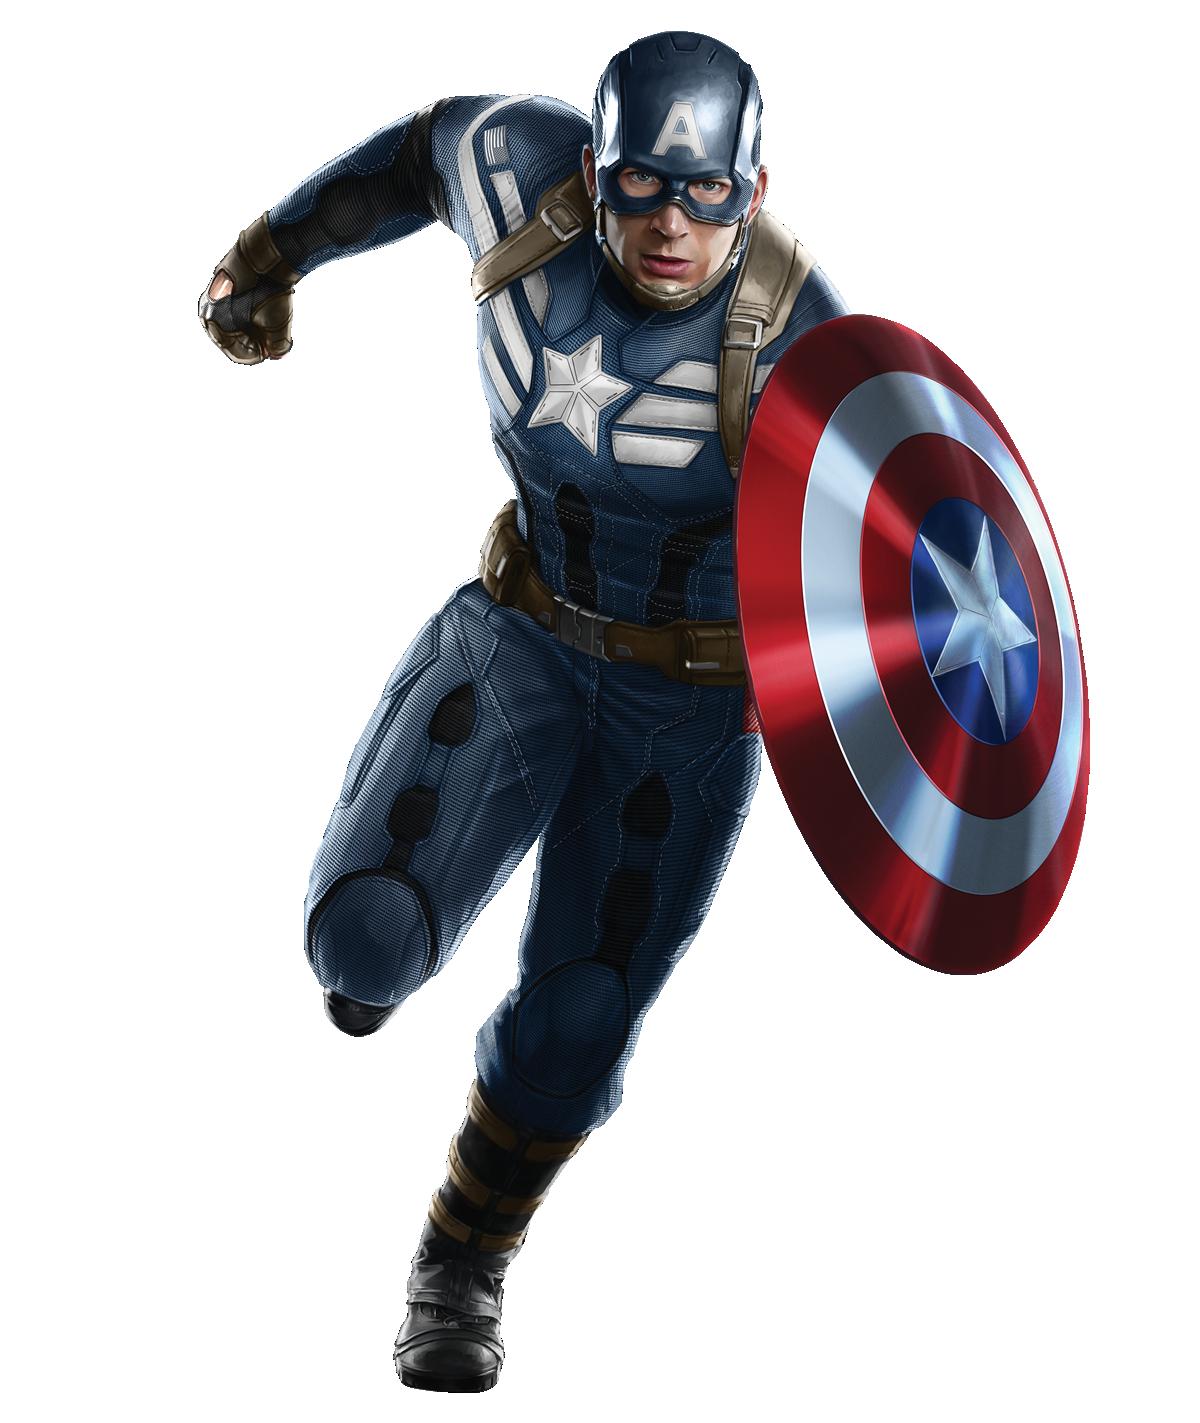 Marvel civil war clipart free Captain america civil war clipart - ClipartFox free